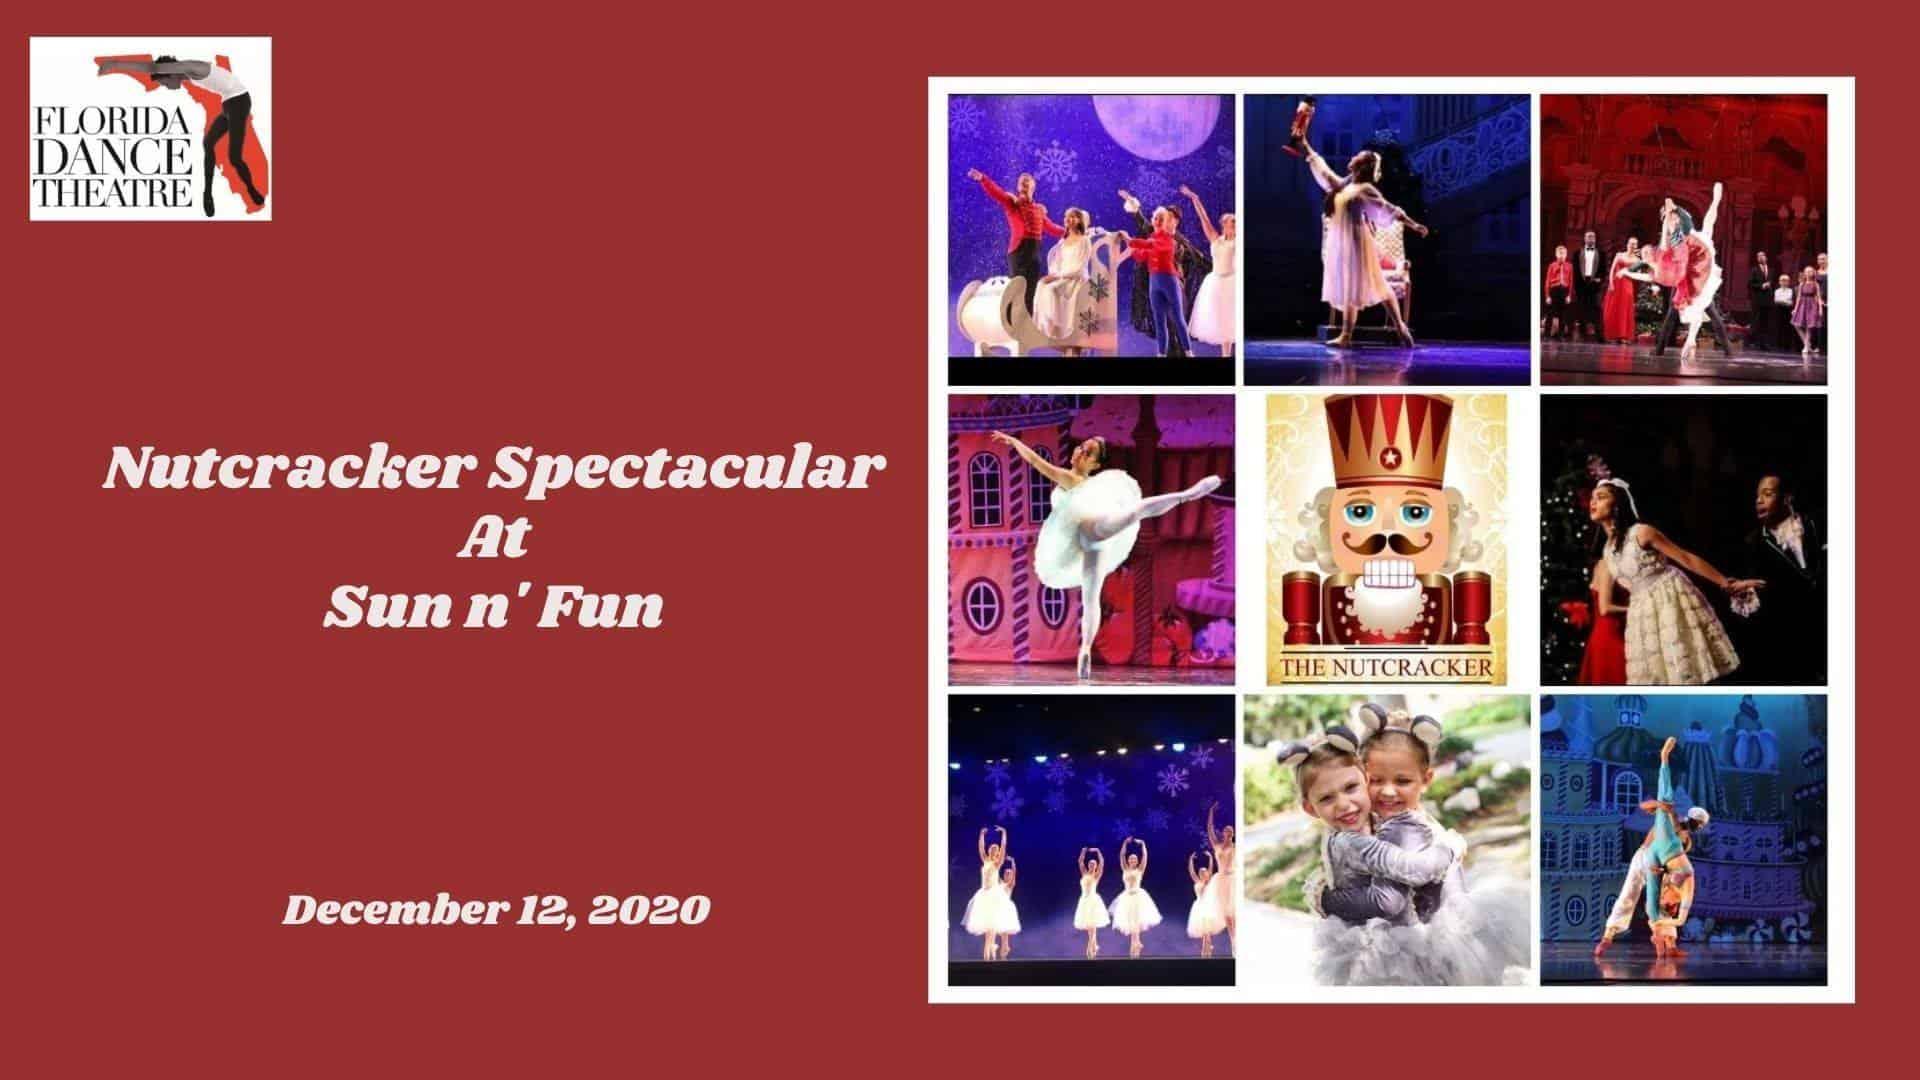 Nutcracker Spectacular at Sun n' Fun - December 12, 2020